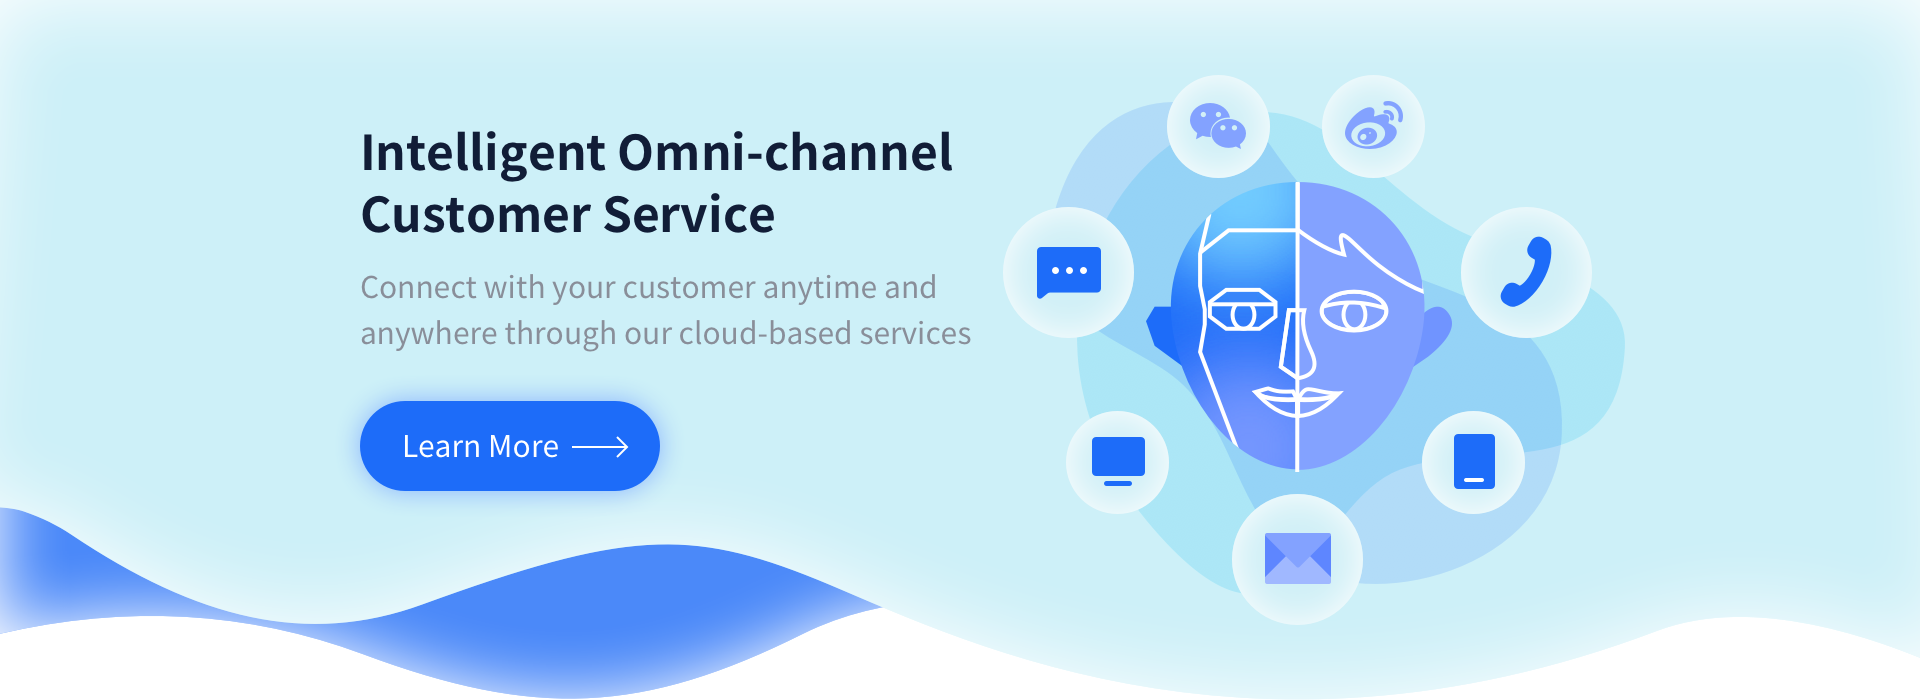 Intelligent omni-channel customer service